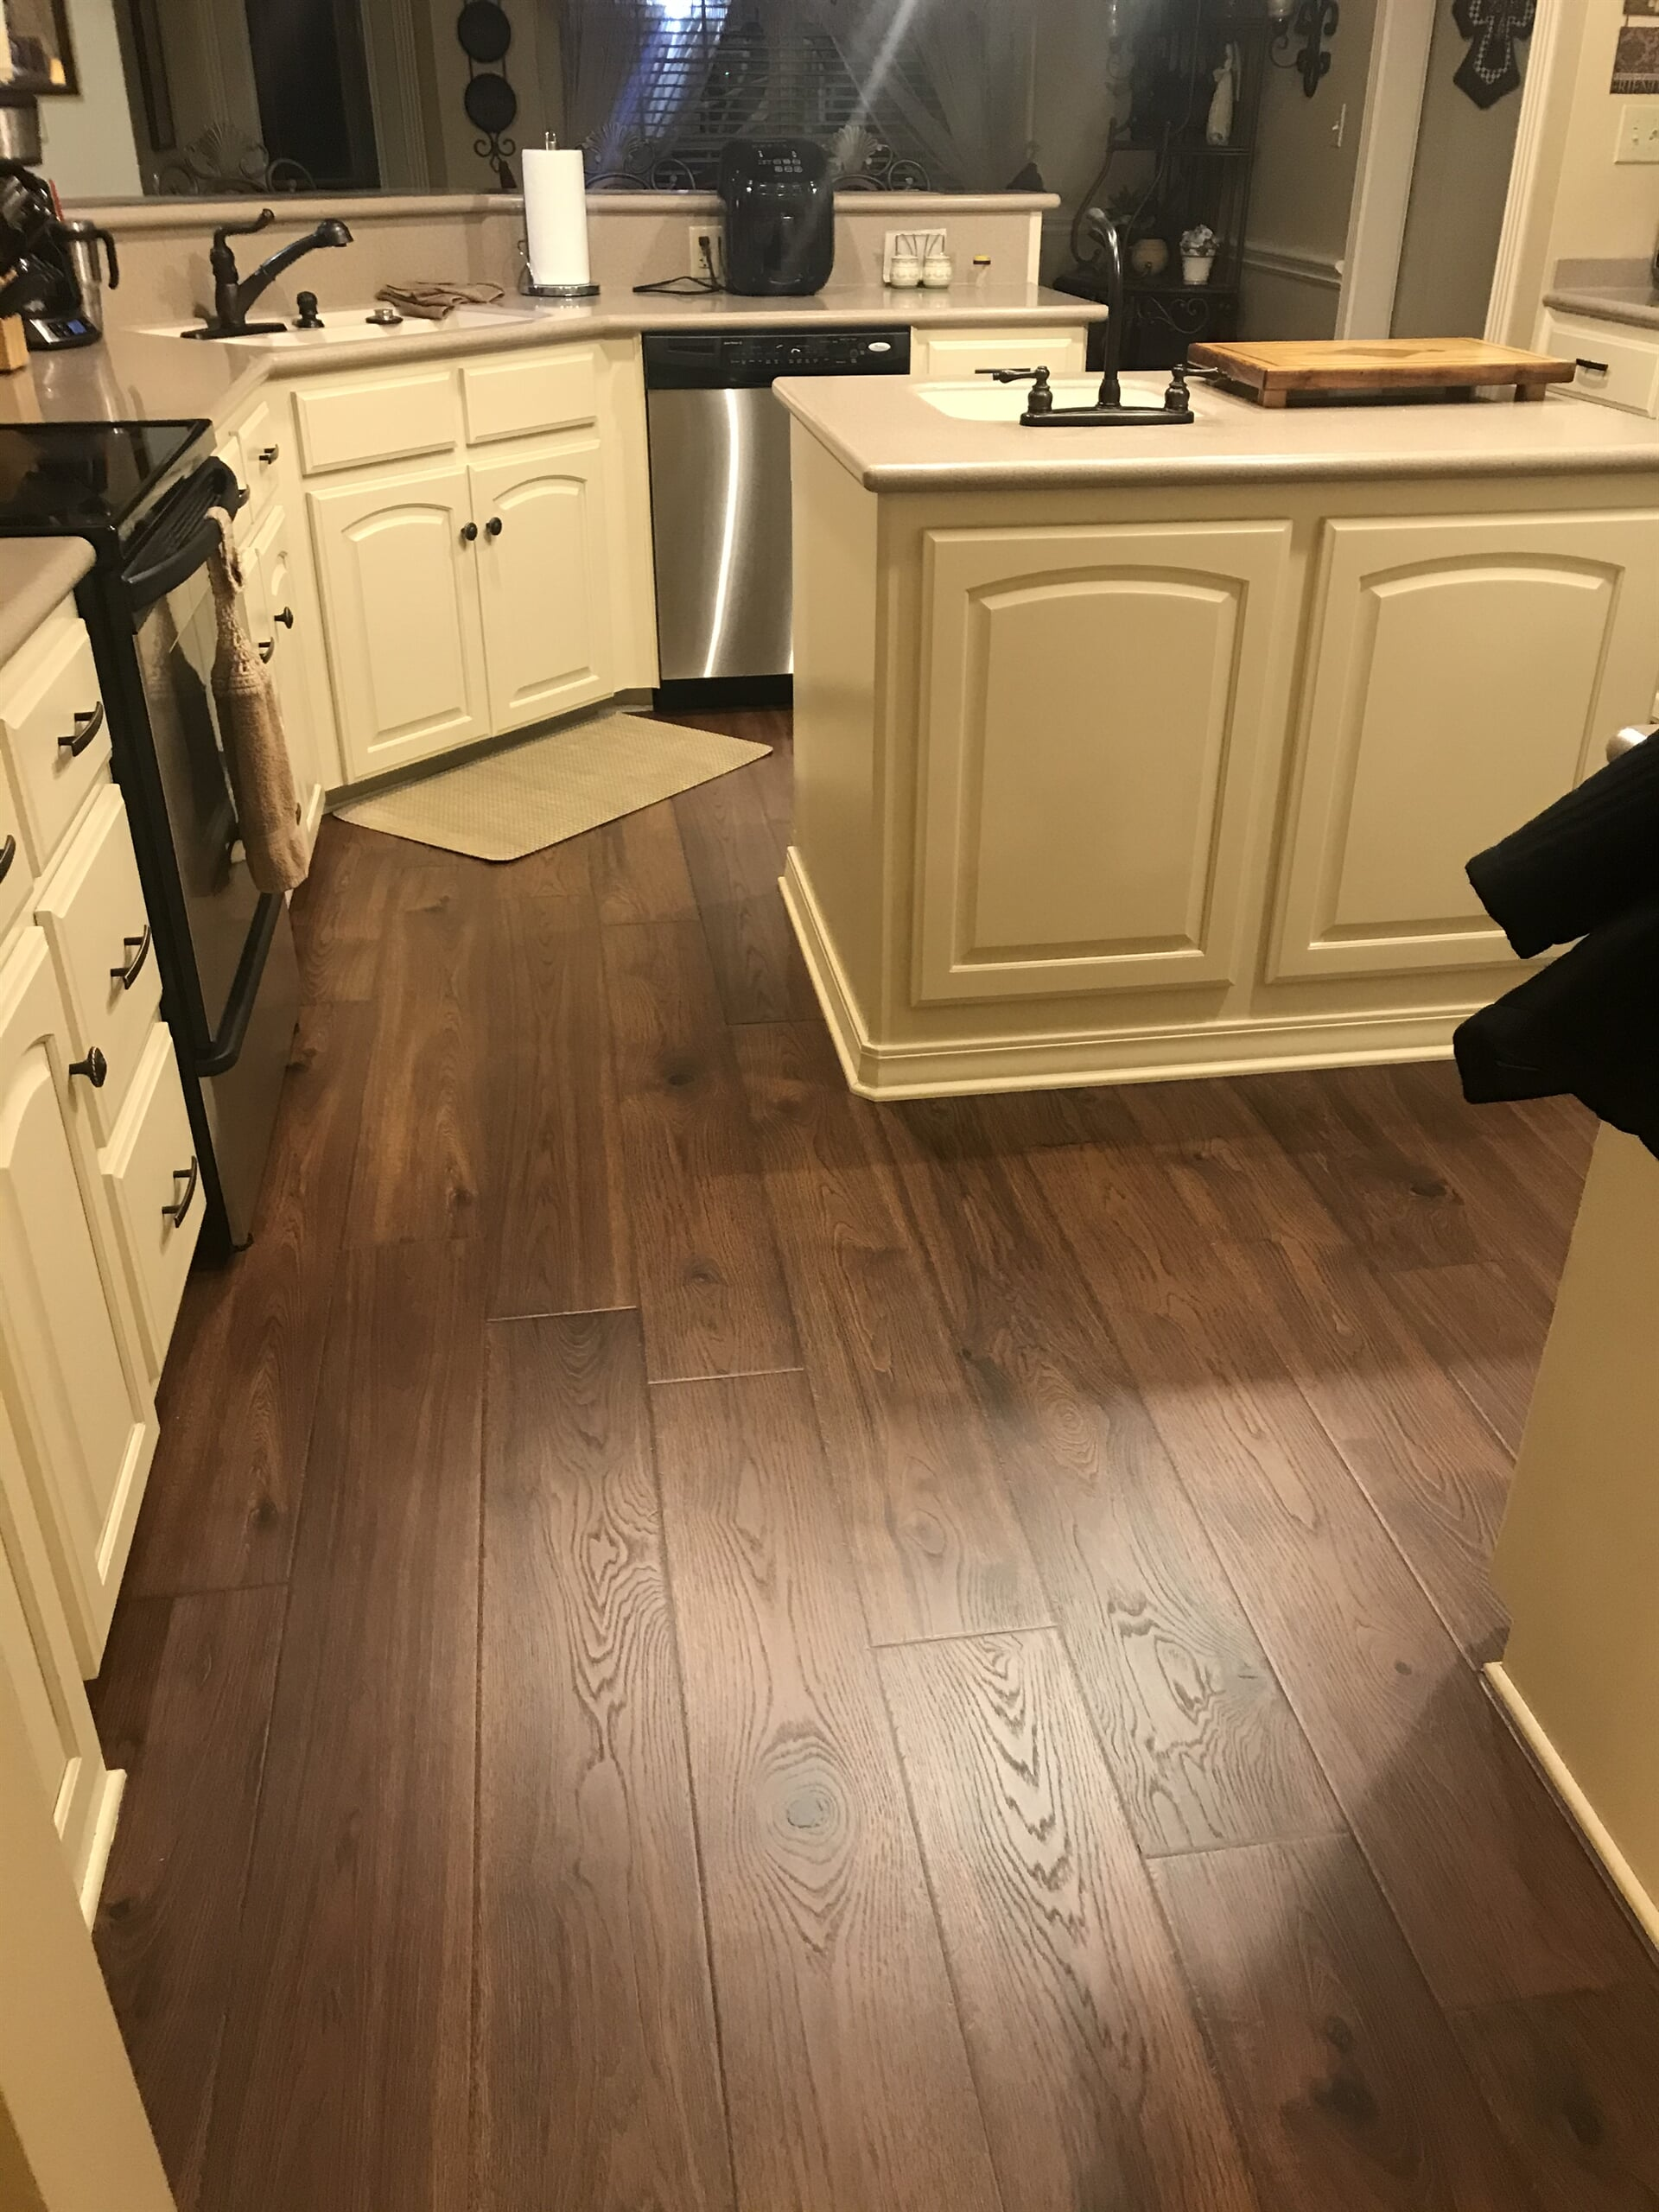 Luxury vinyl plank from Roop's Carpet in Searcy, AR